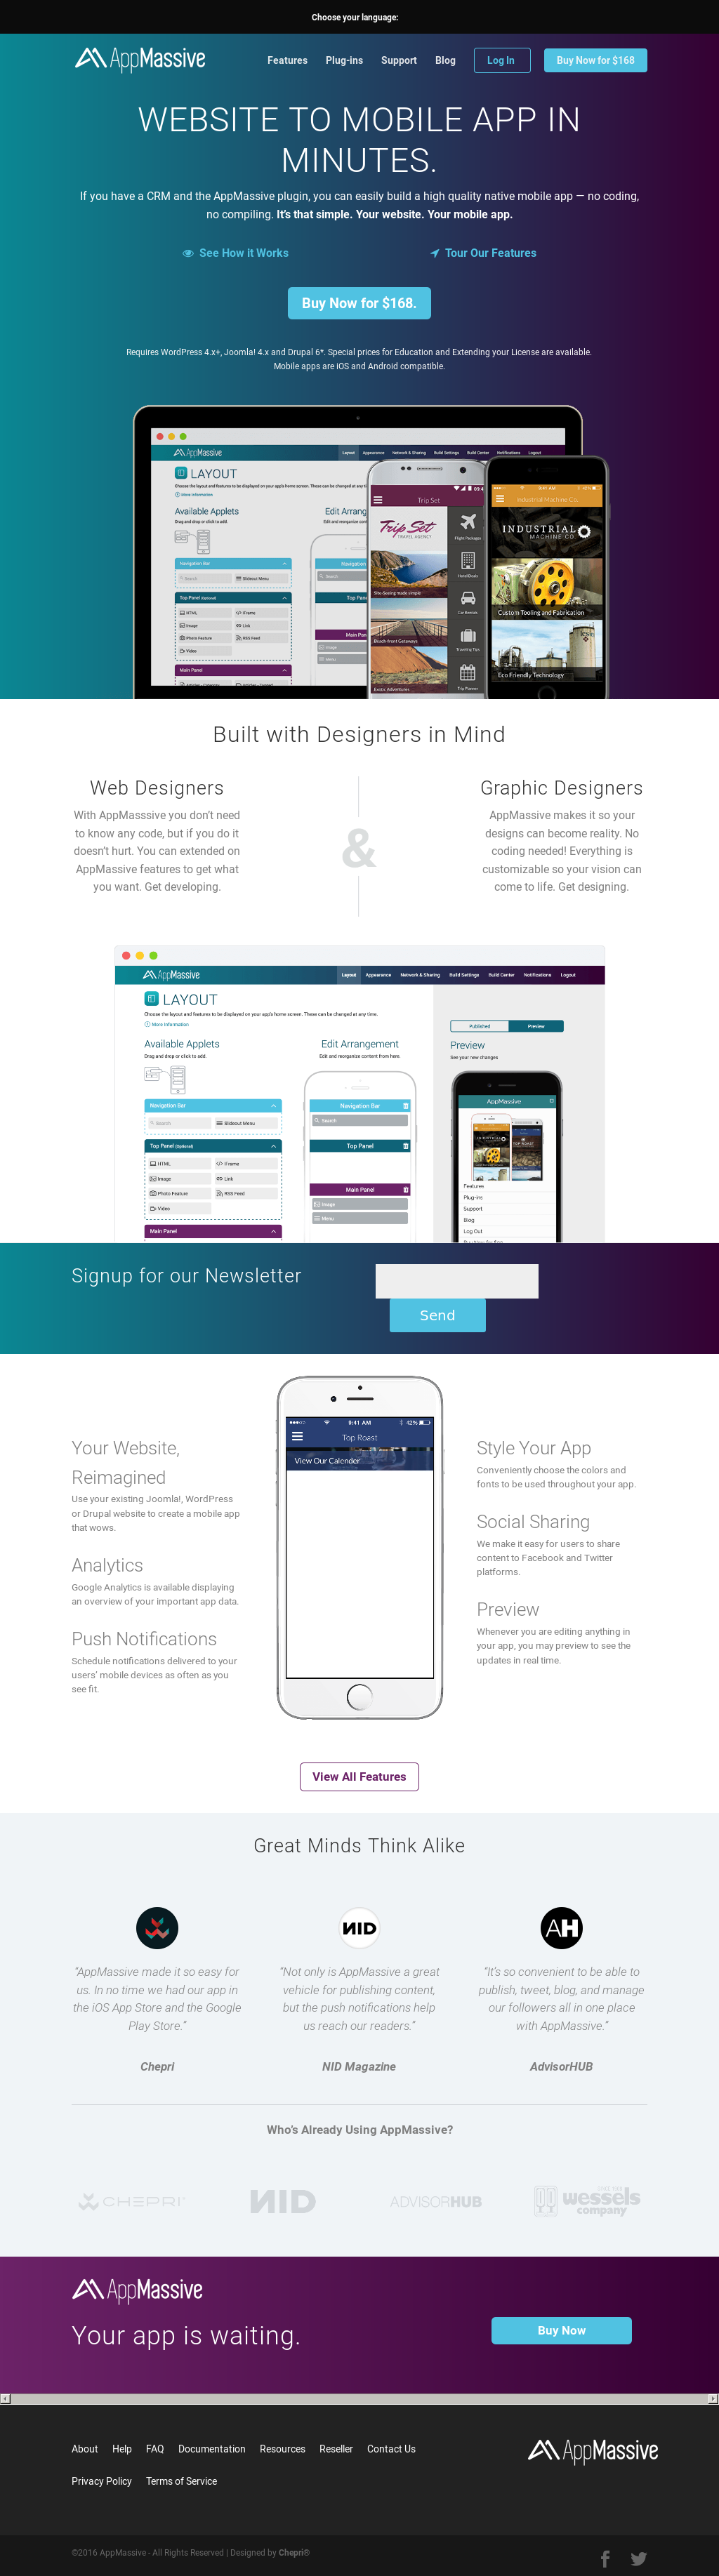 Loanloft Competitors, Revenue and Employees - Owler Company Profile